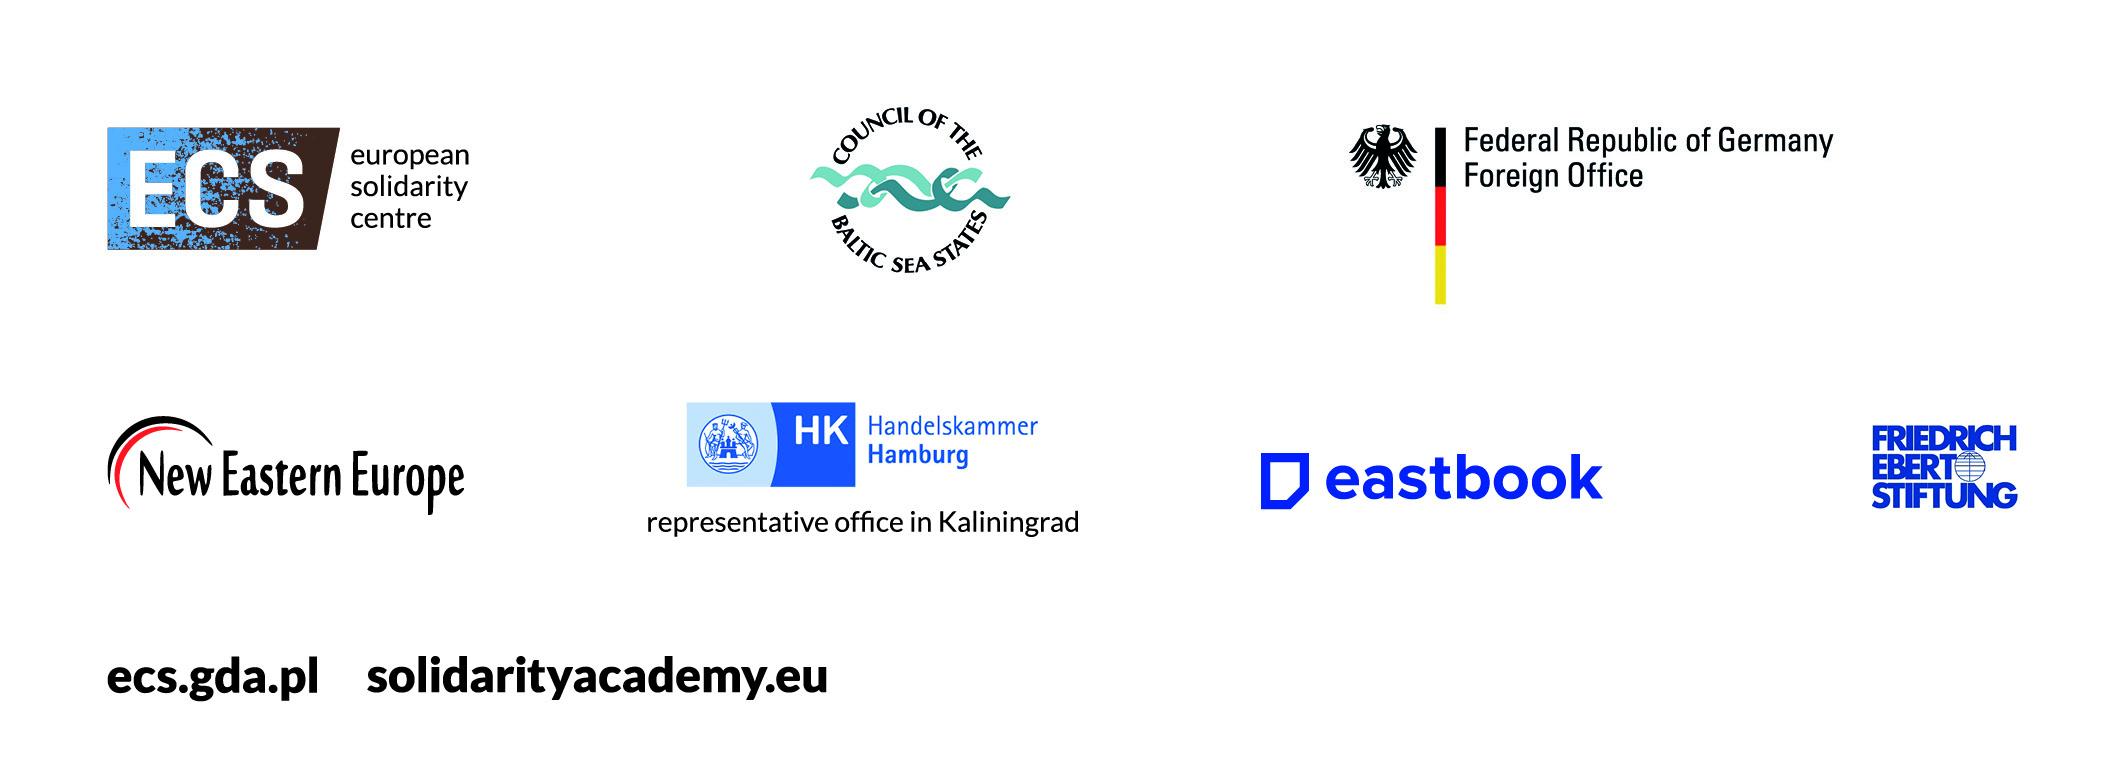 Akademia-Solidarnosci-2016-logotypyCMYK 2